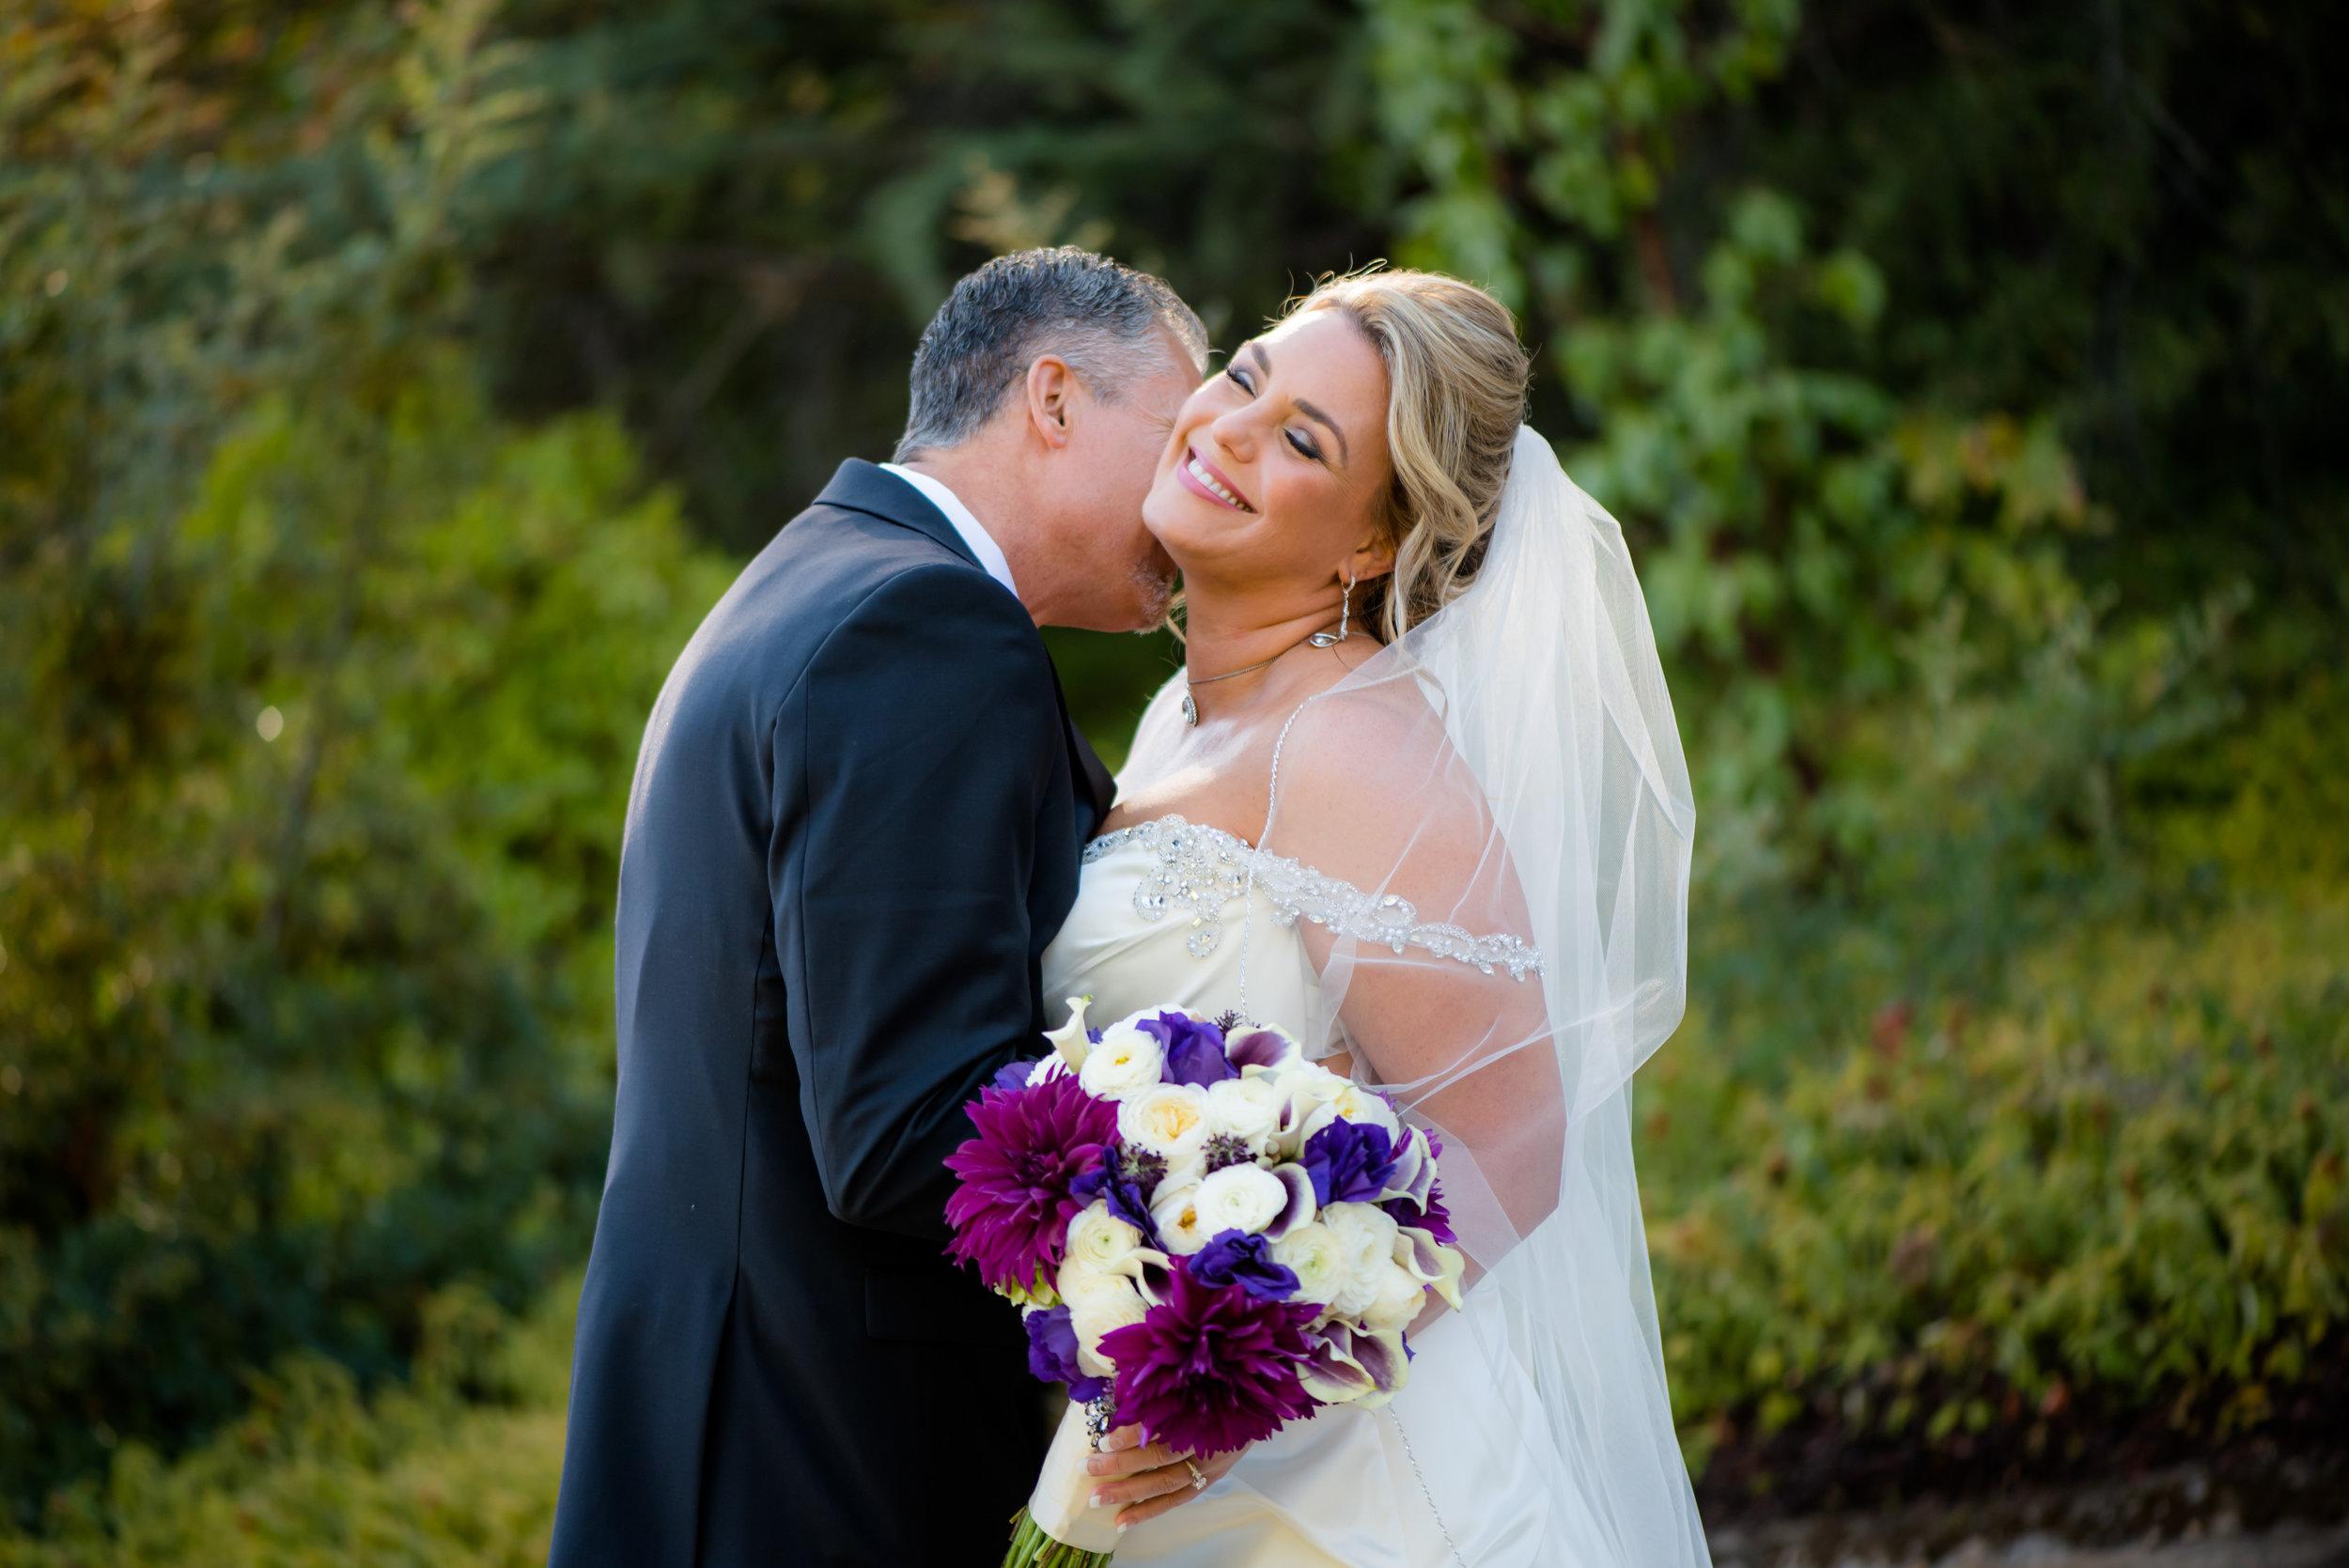 kara-craig-019-monte-verde-inn-sacramento-wedding-photographer-katherine-nicole-photography.JPG